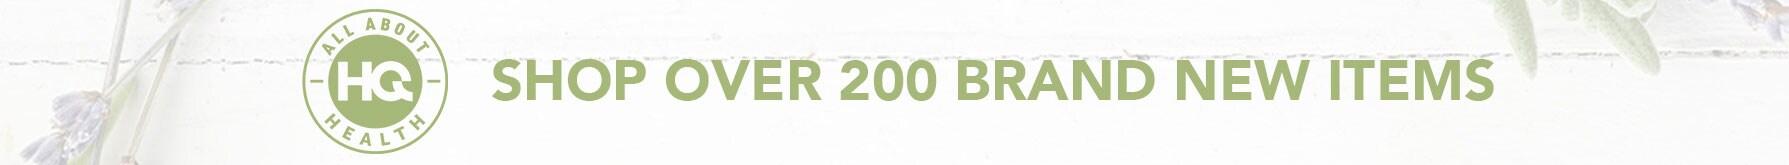 Event Logo   Shop Over 200 Brand New Items